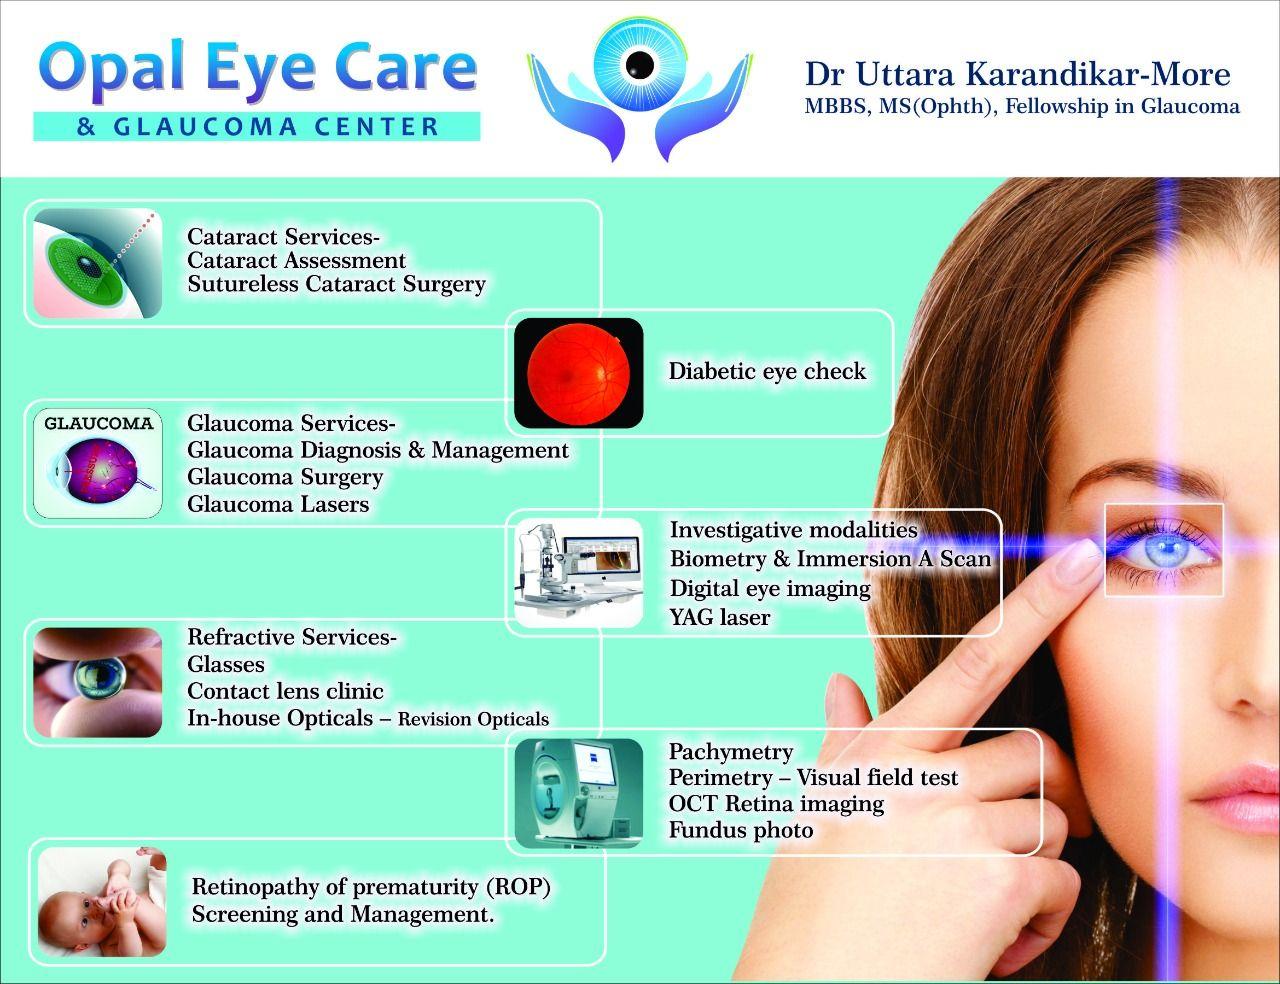 Opal Eye Care provides various service Opal eyes, Eye